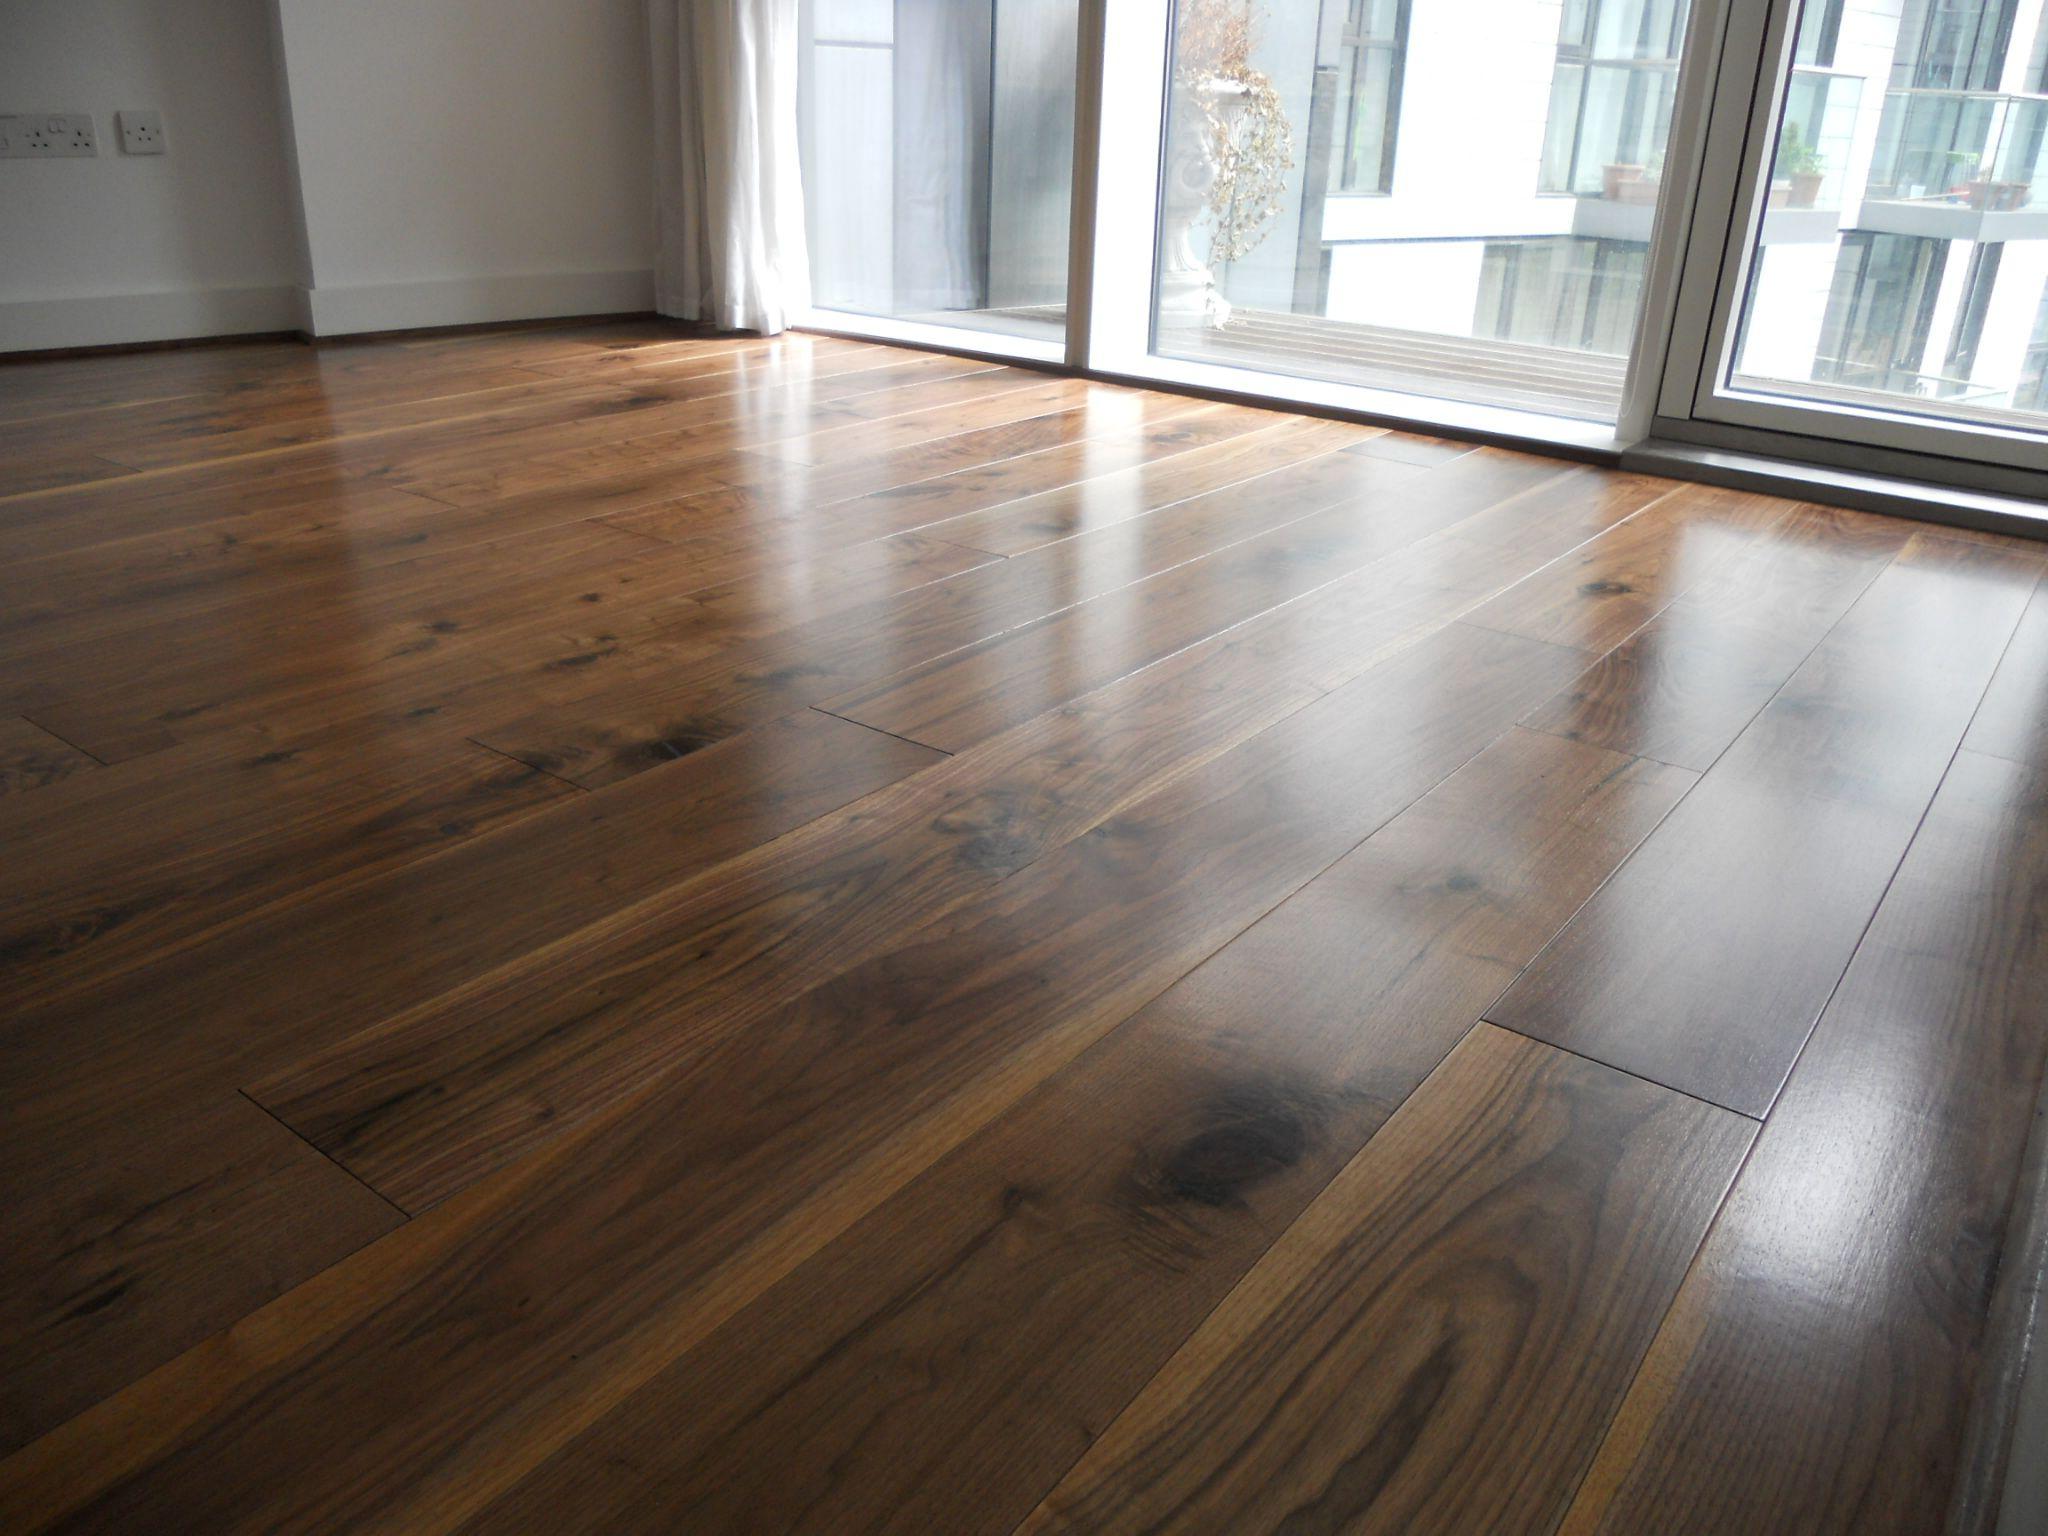 Clic Nature Grade American Black Walnut Aldgate London William Beard Flooring